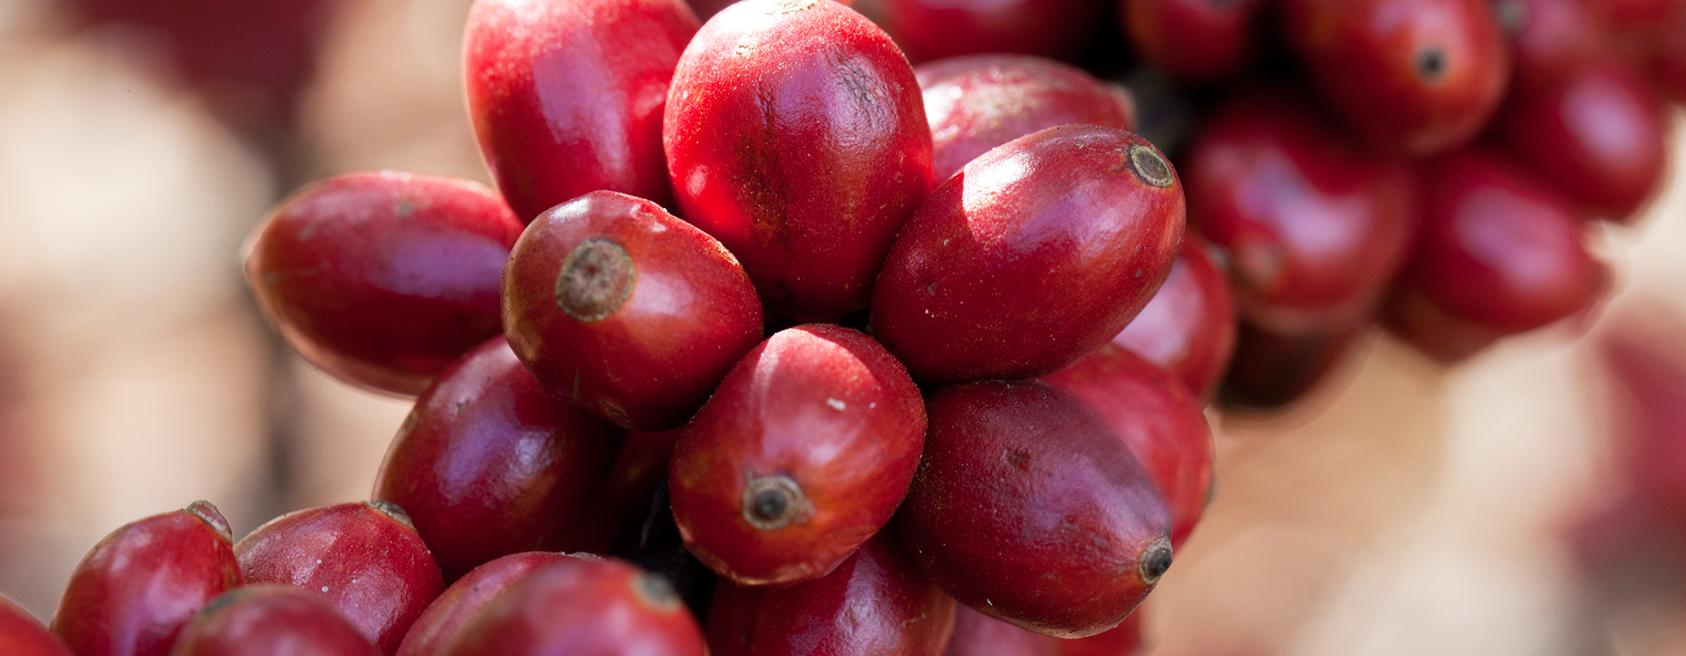 Kaffee des Monats August: Äthiopien Yirgacheffe